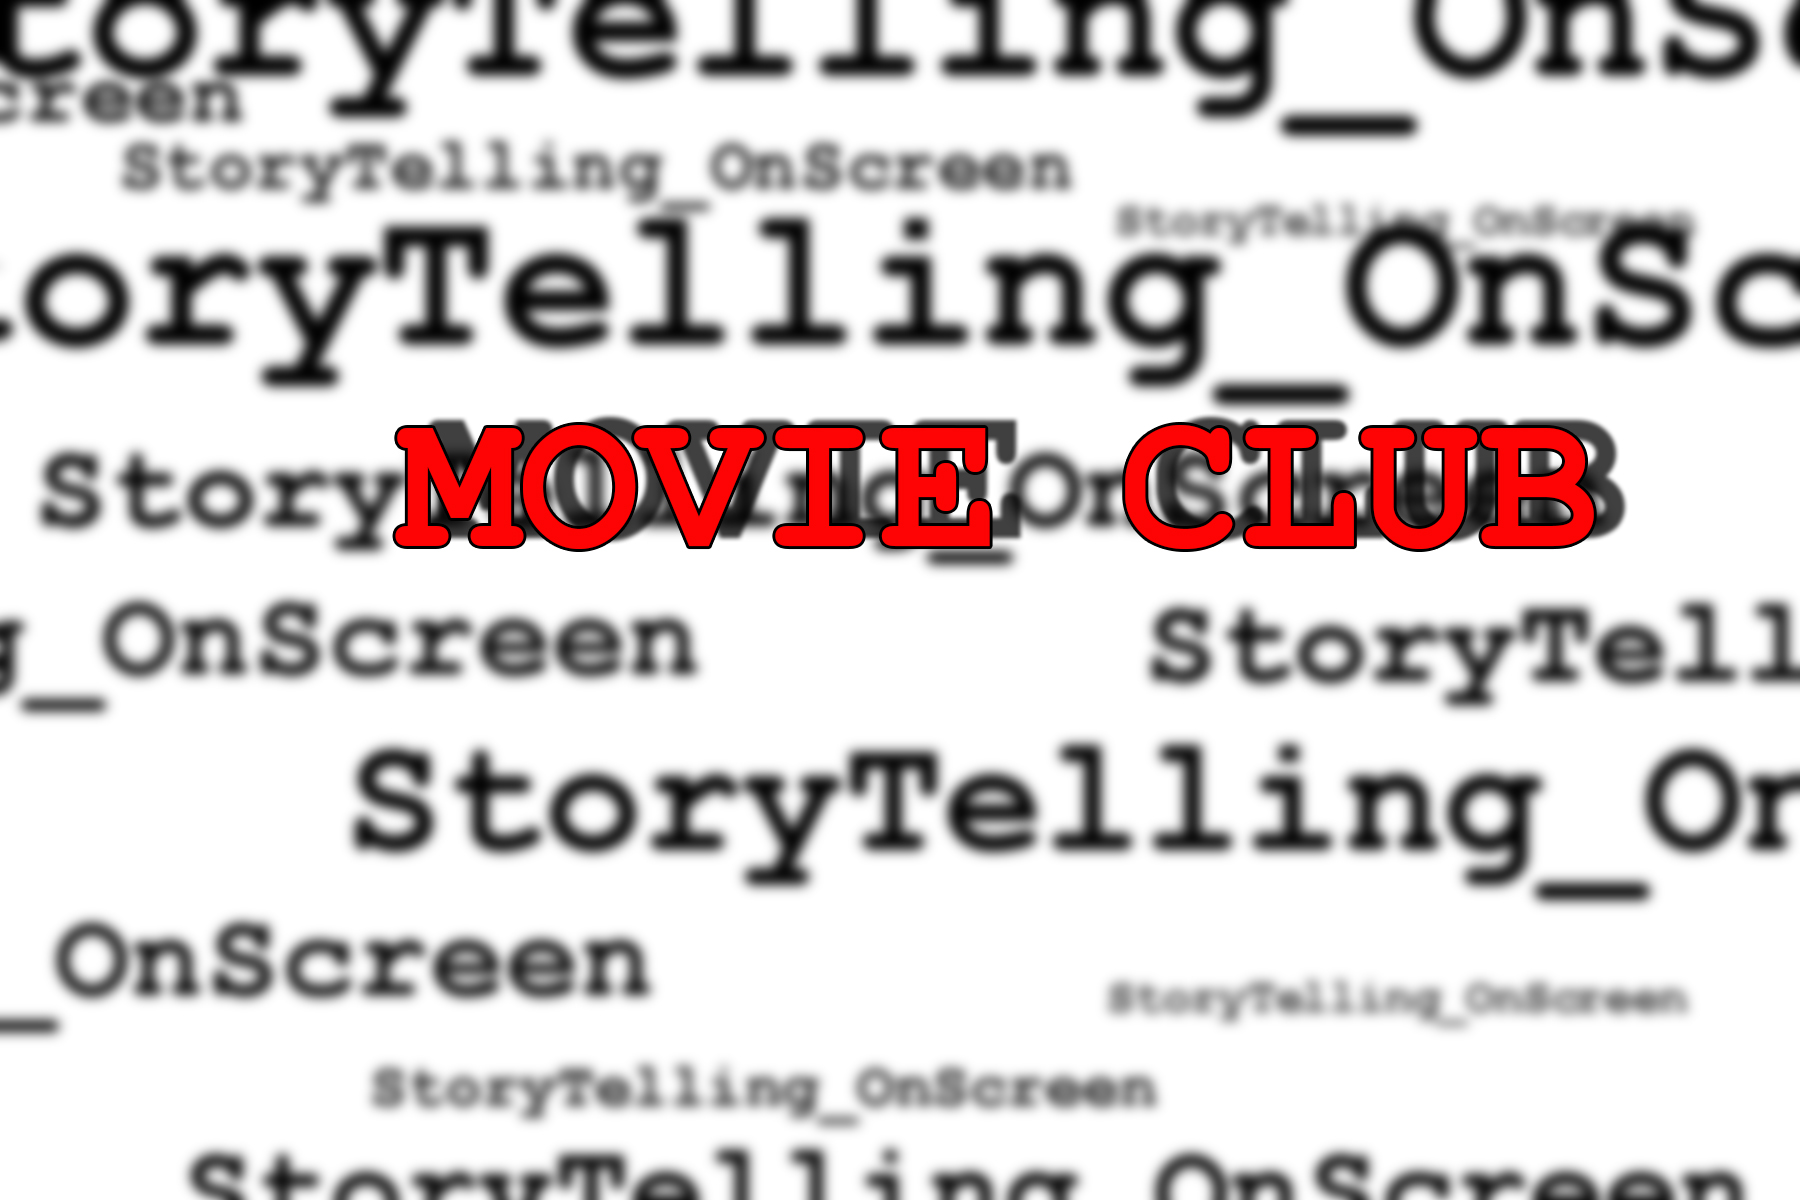 StoryTelling_OnScreen Movie Club